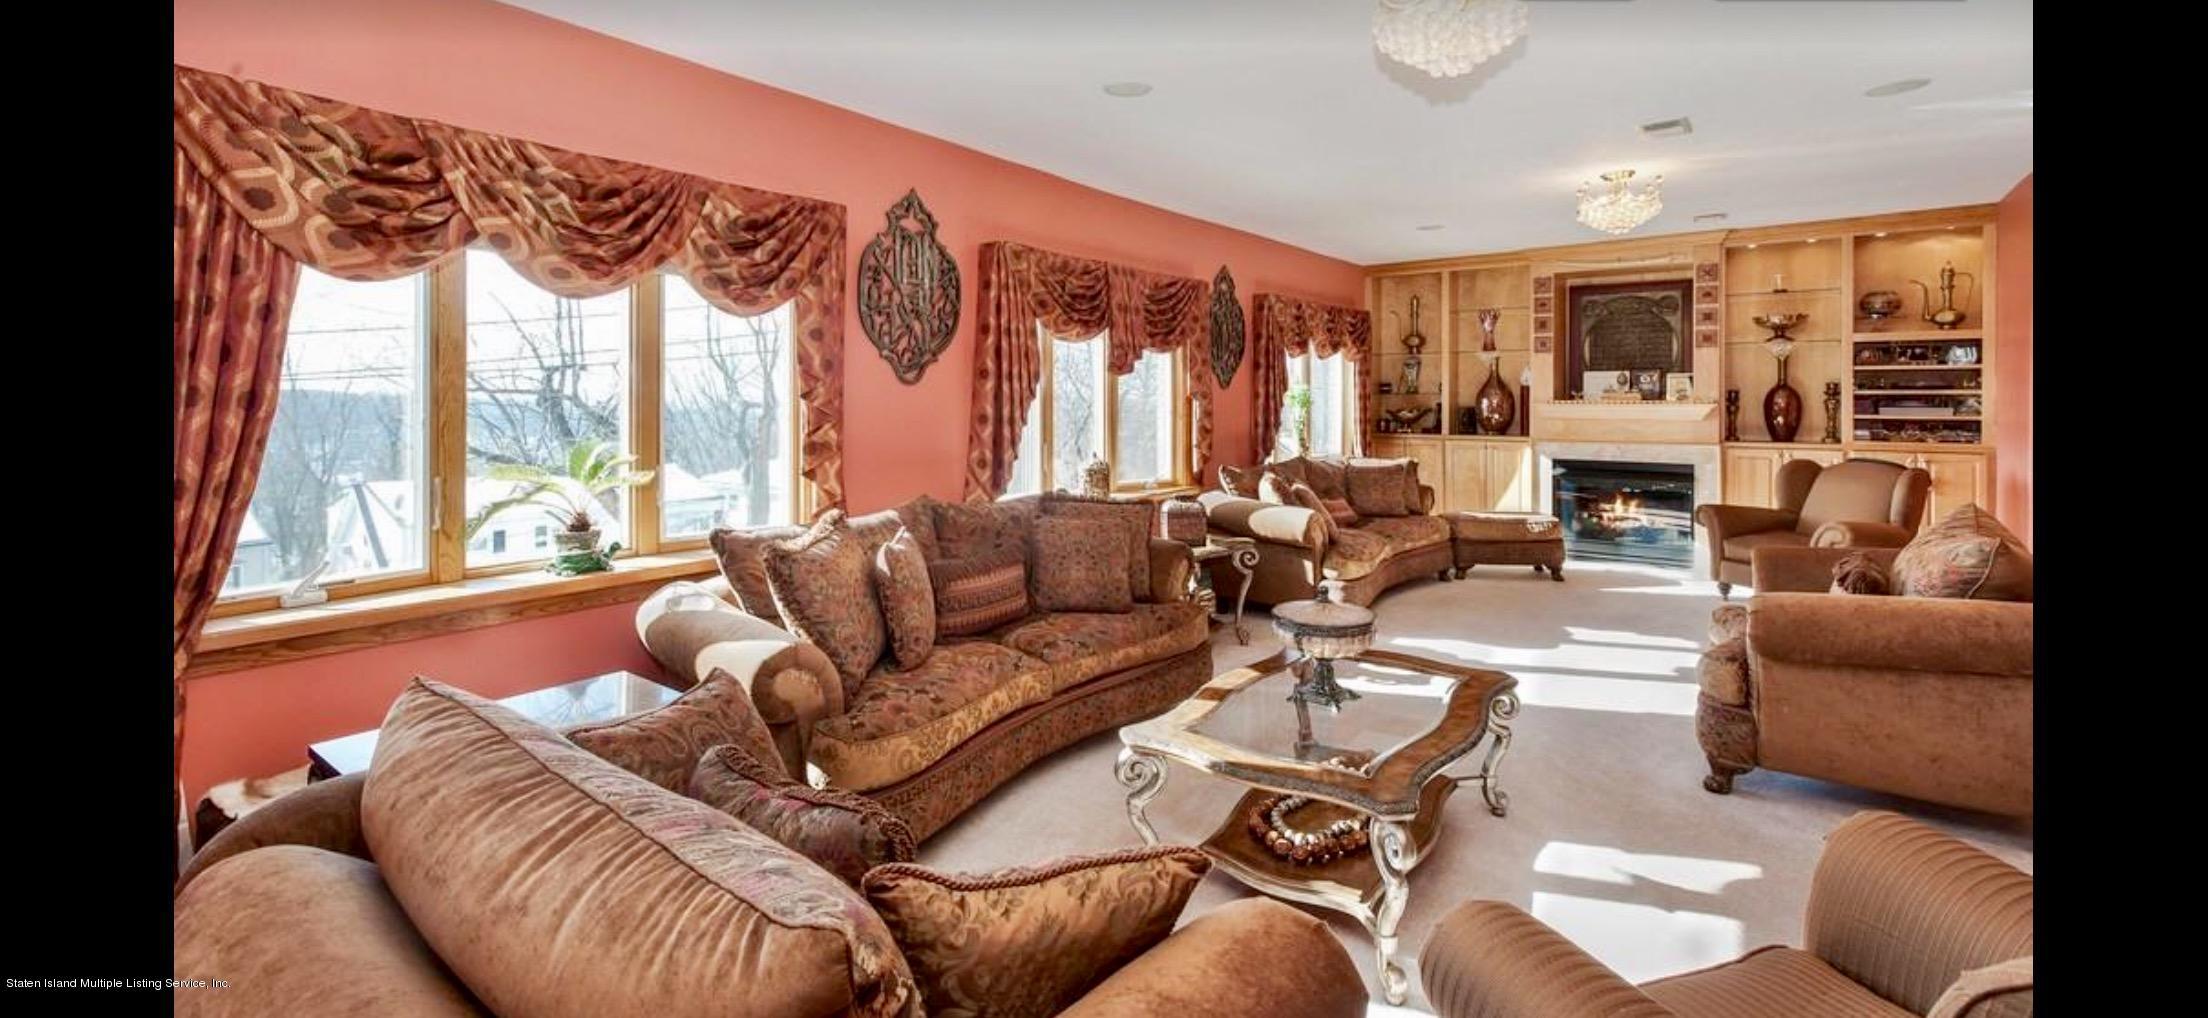 Single Family - Detached 155 Highland Avenue  Staten Island, NY 10301, MLS-1125114-3